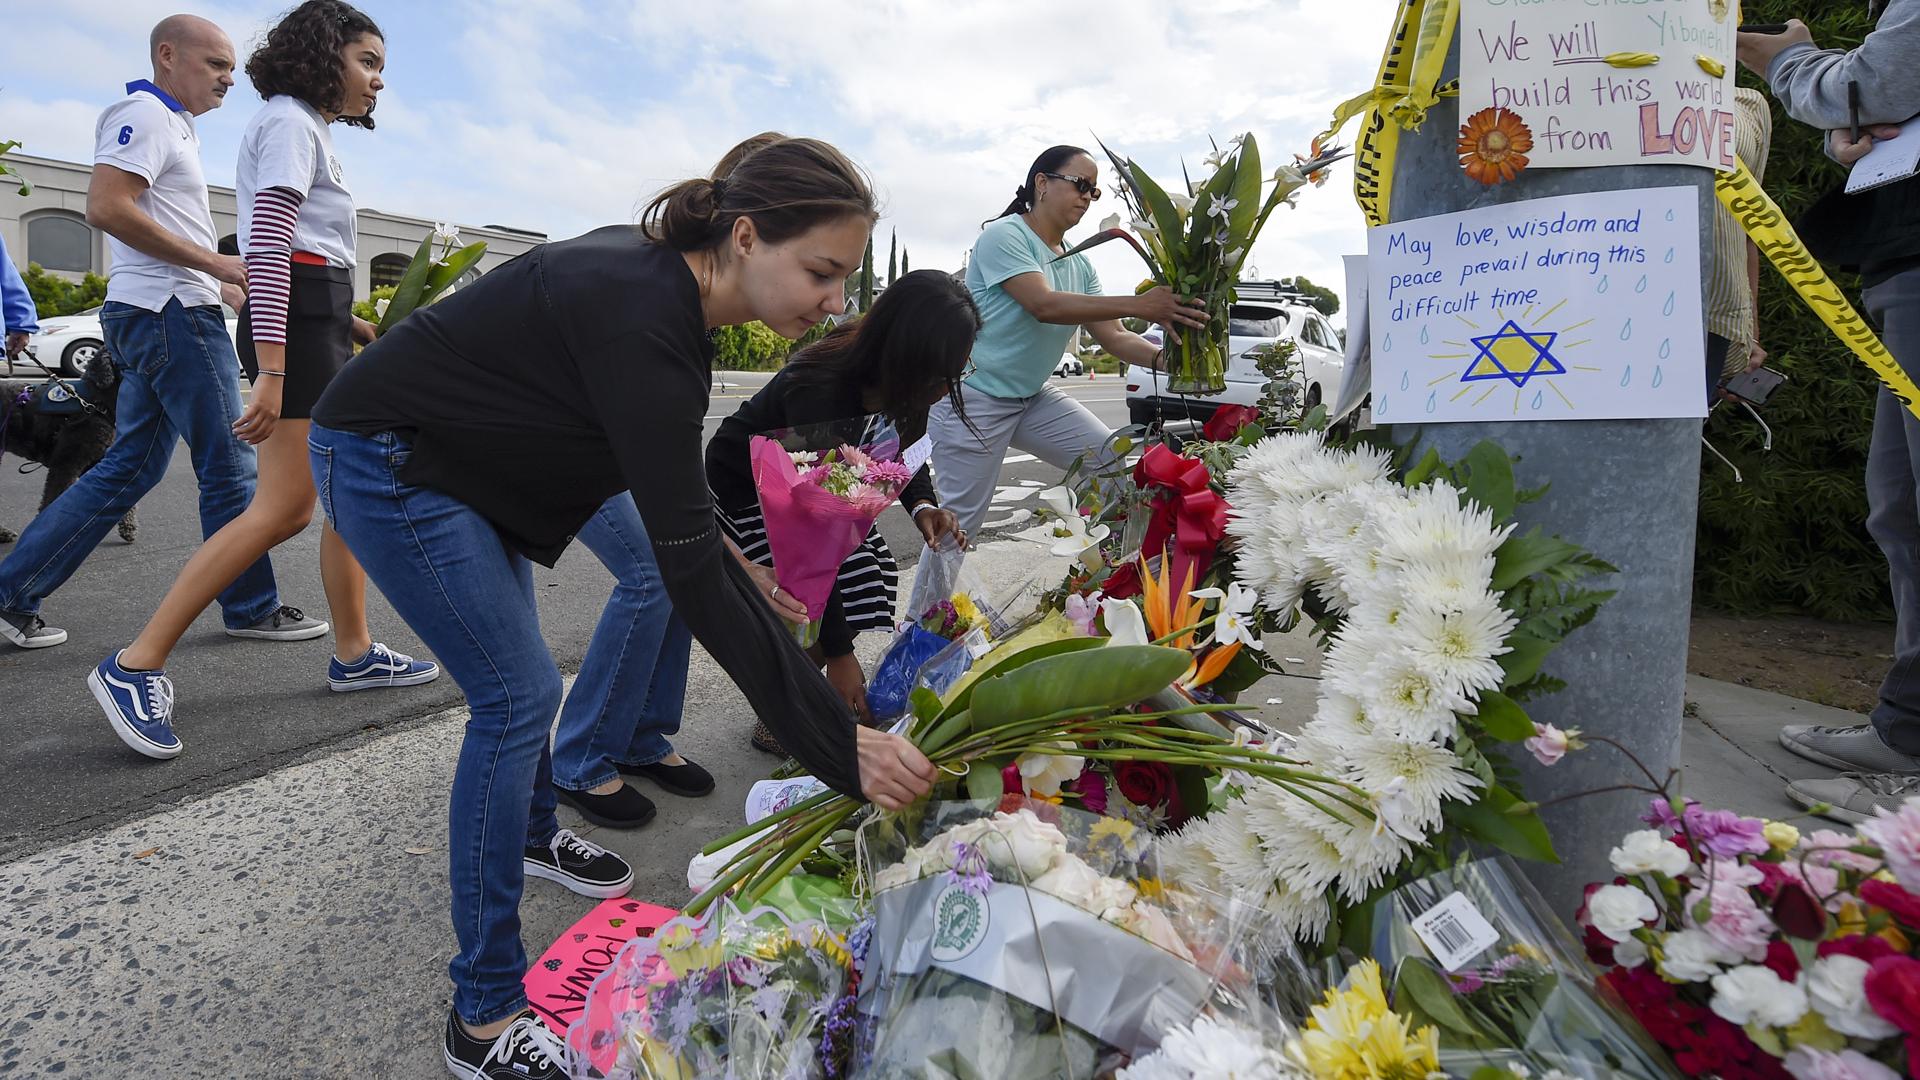 Poway synagogue attack memorial 0421819 AP_1556488226220